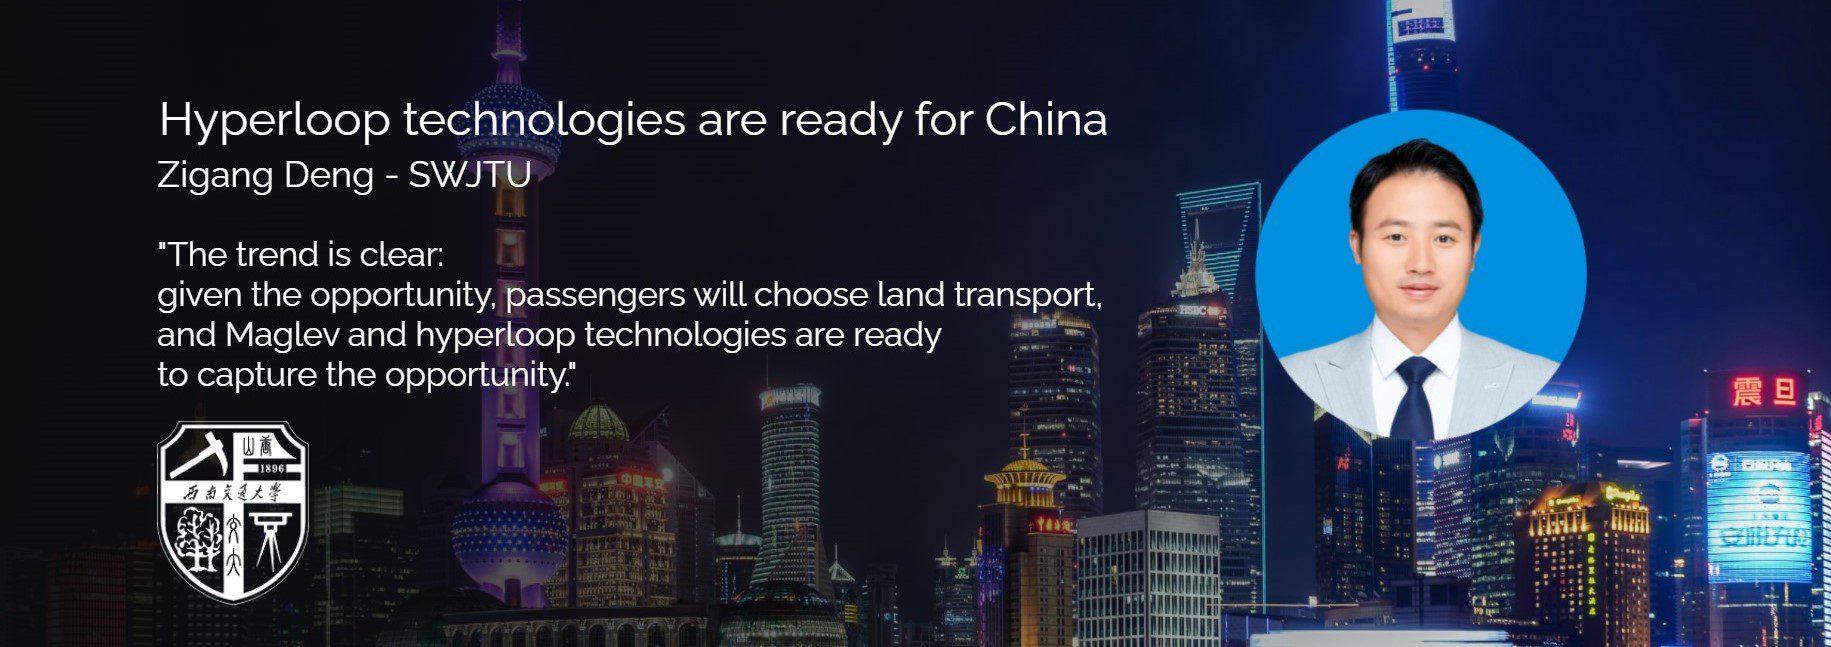 Chinese Partner